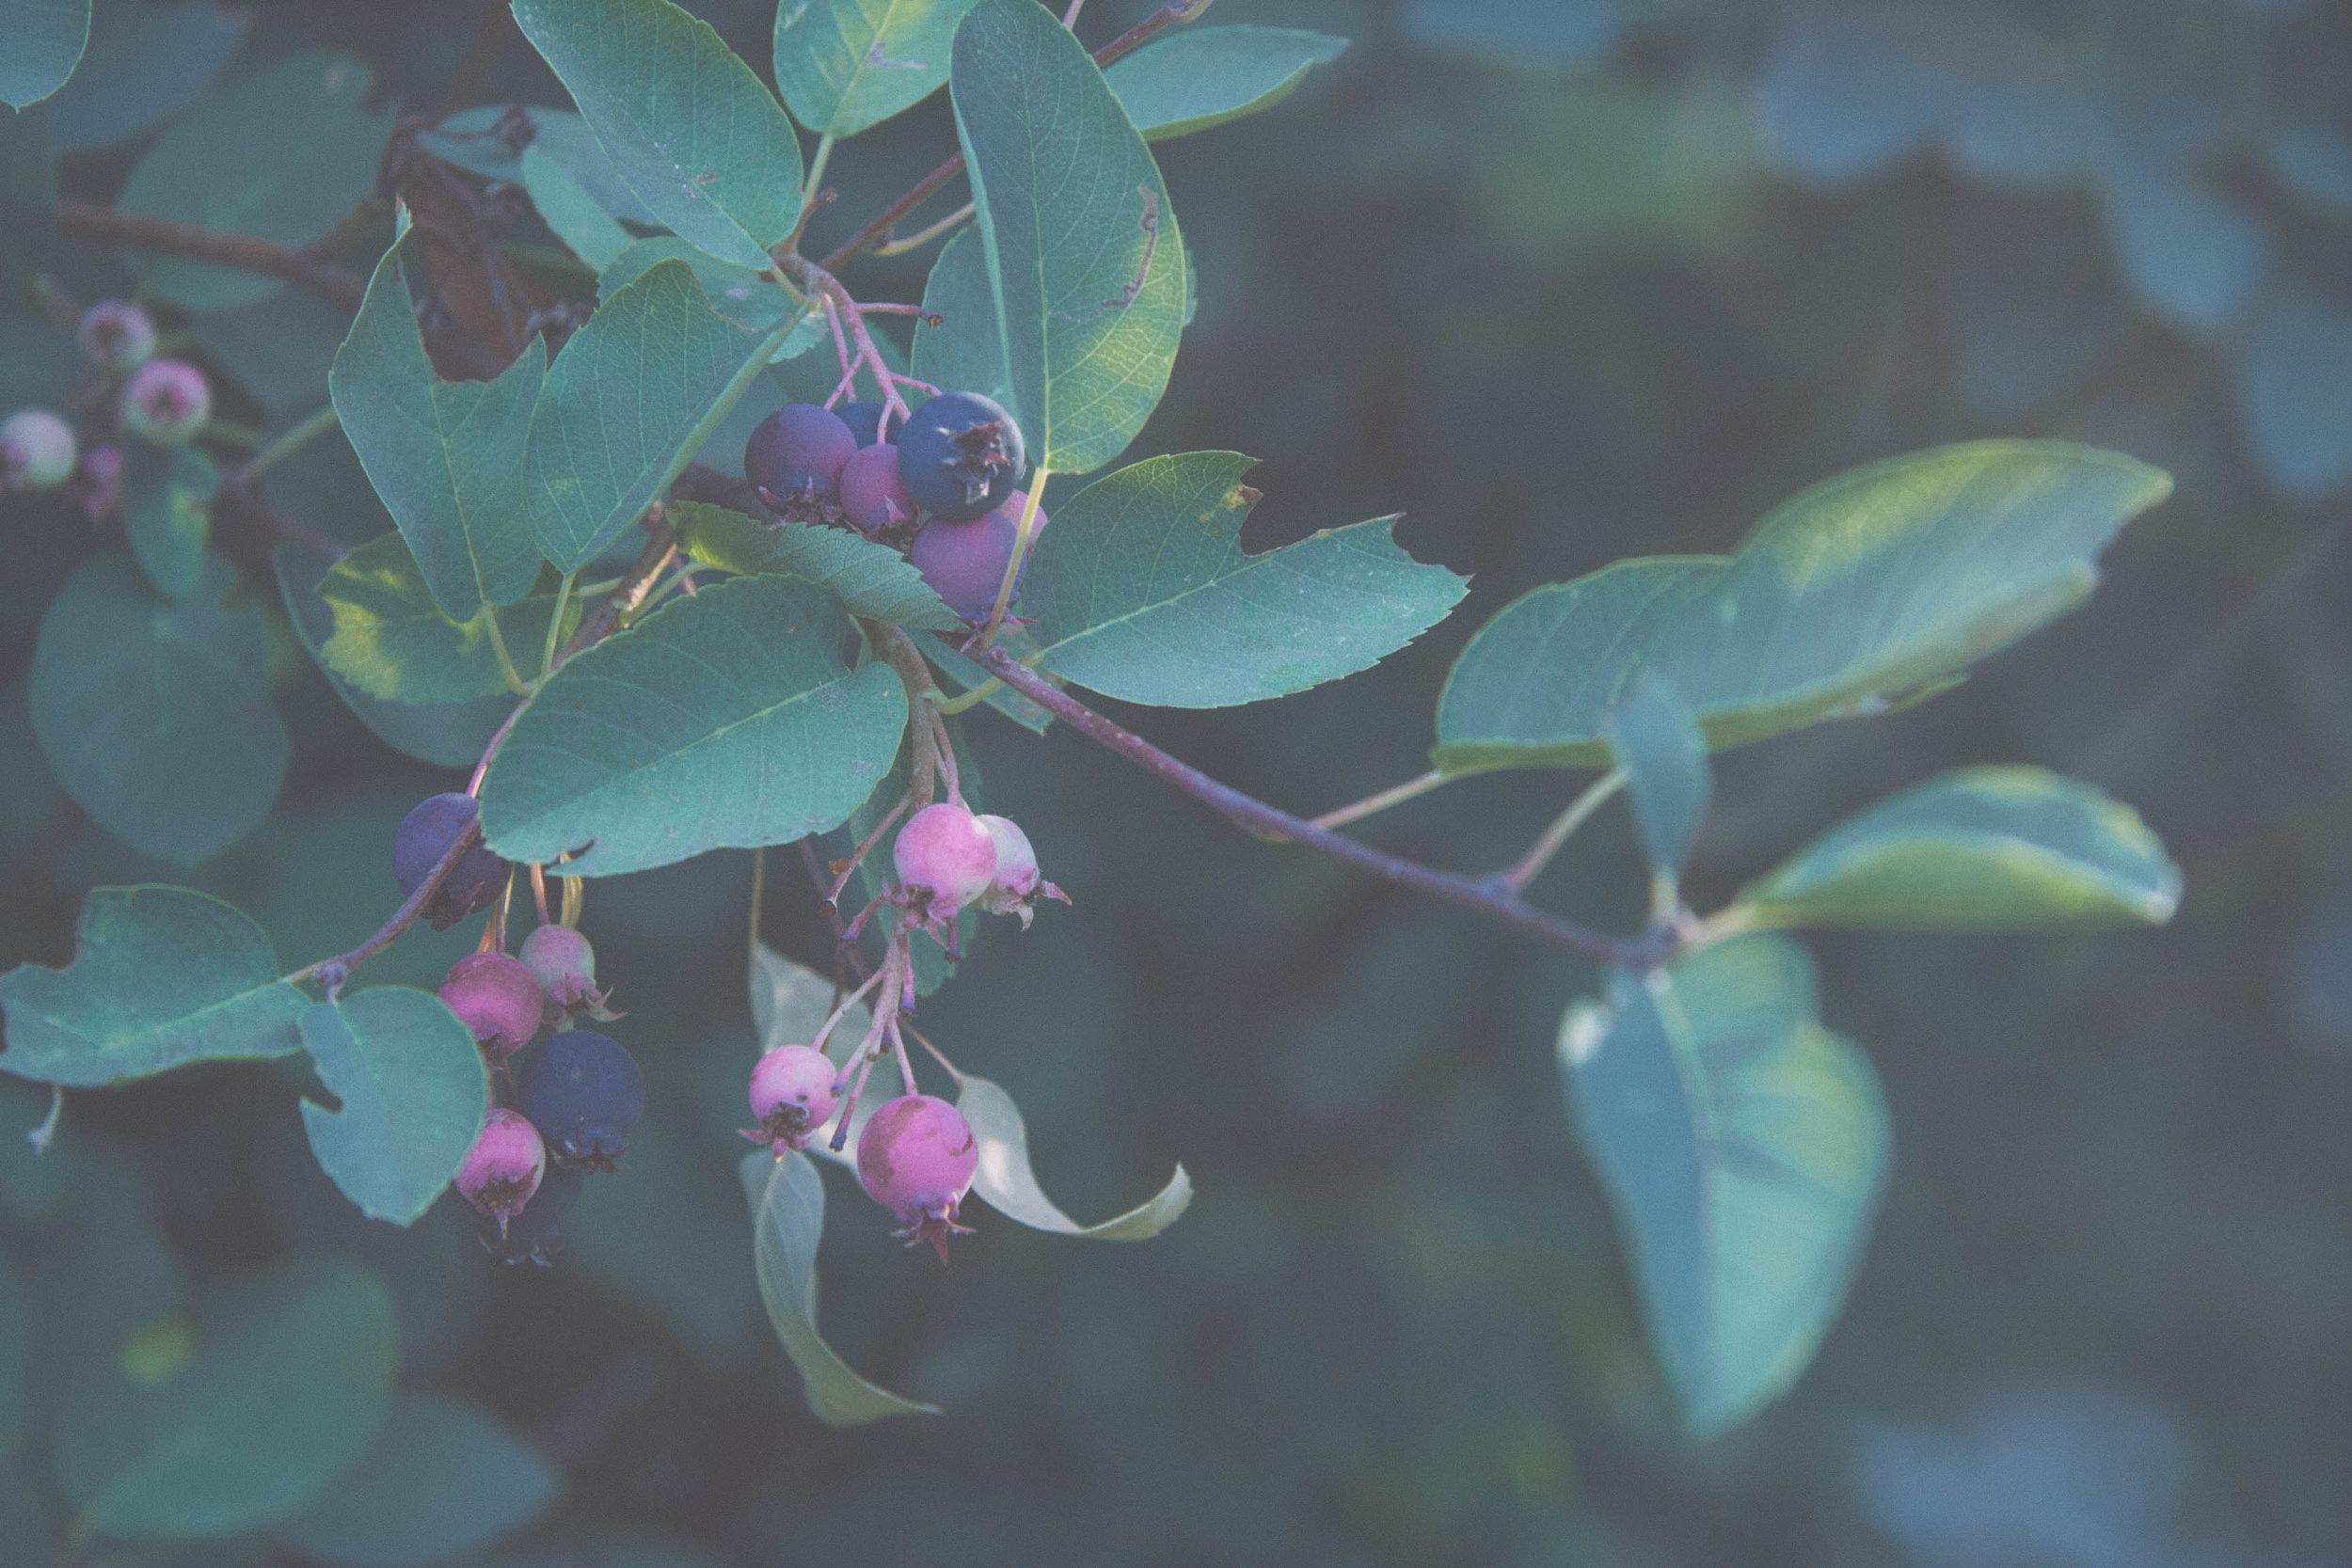 Serviceberry,  Amelanchier sp.  in northern Idaho, Summer 2017. (Rosaceae)